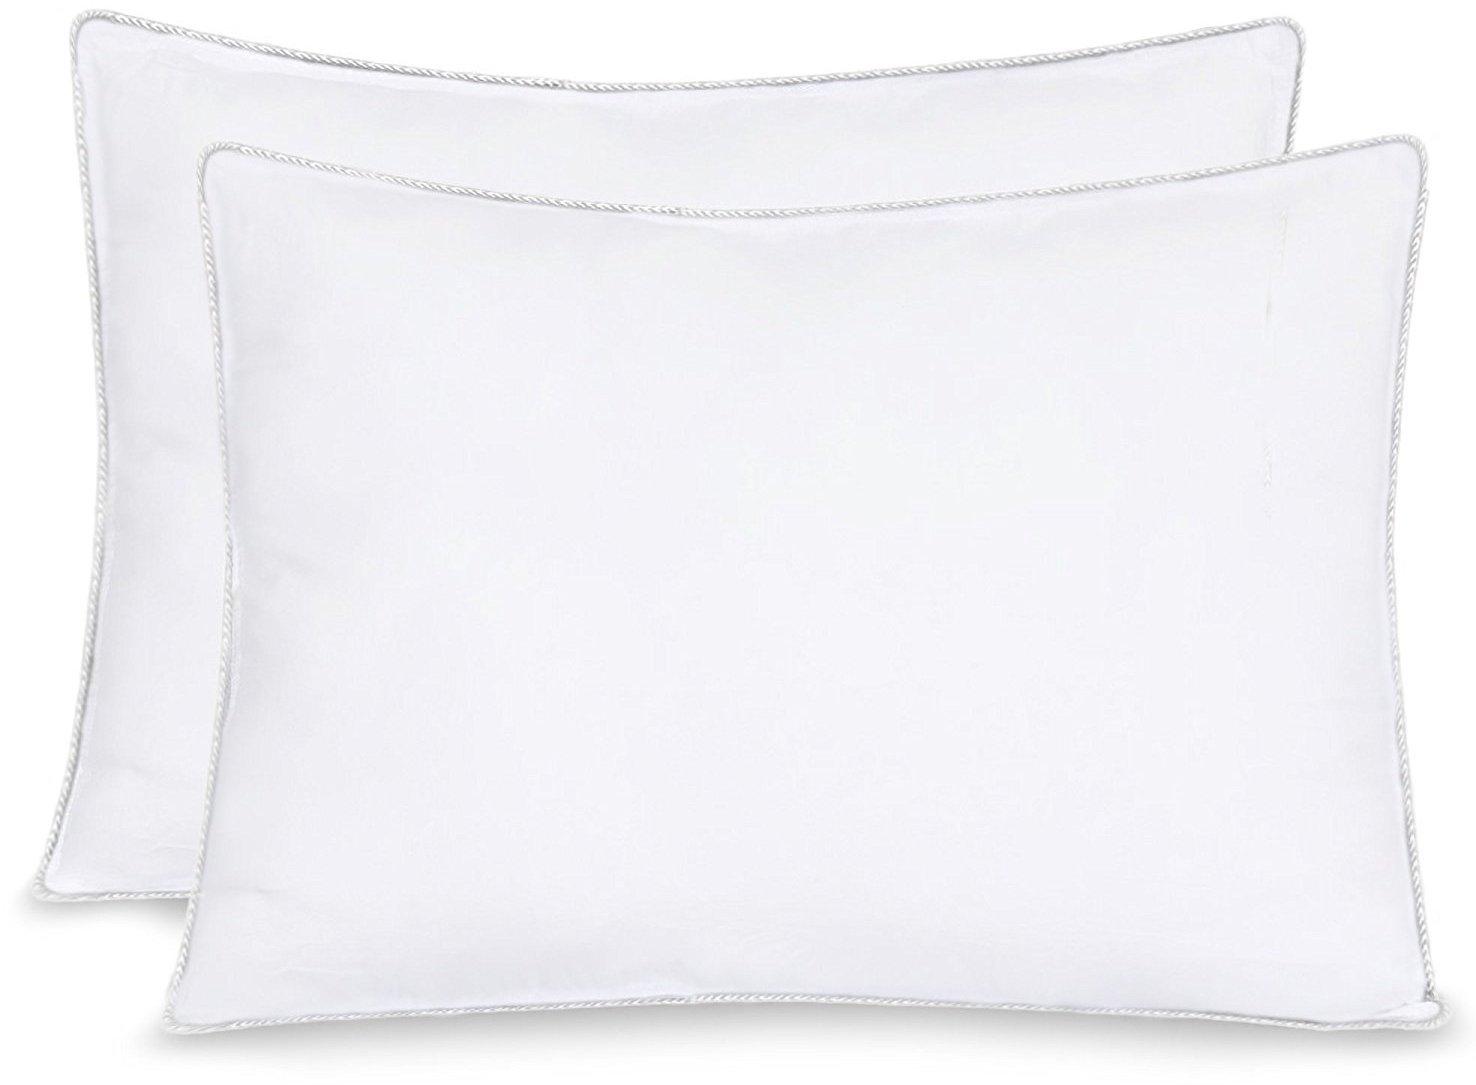 "Equinox - 2-Pack Ultra Soft Bed Pillows 20"" x 26"" $14.95"